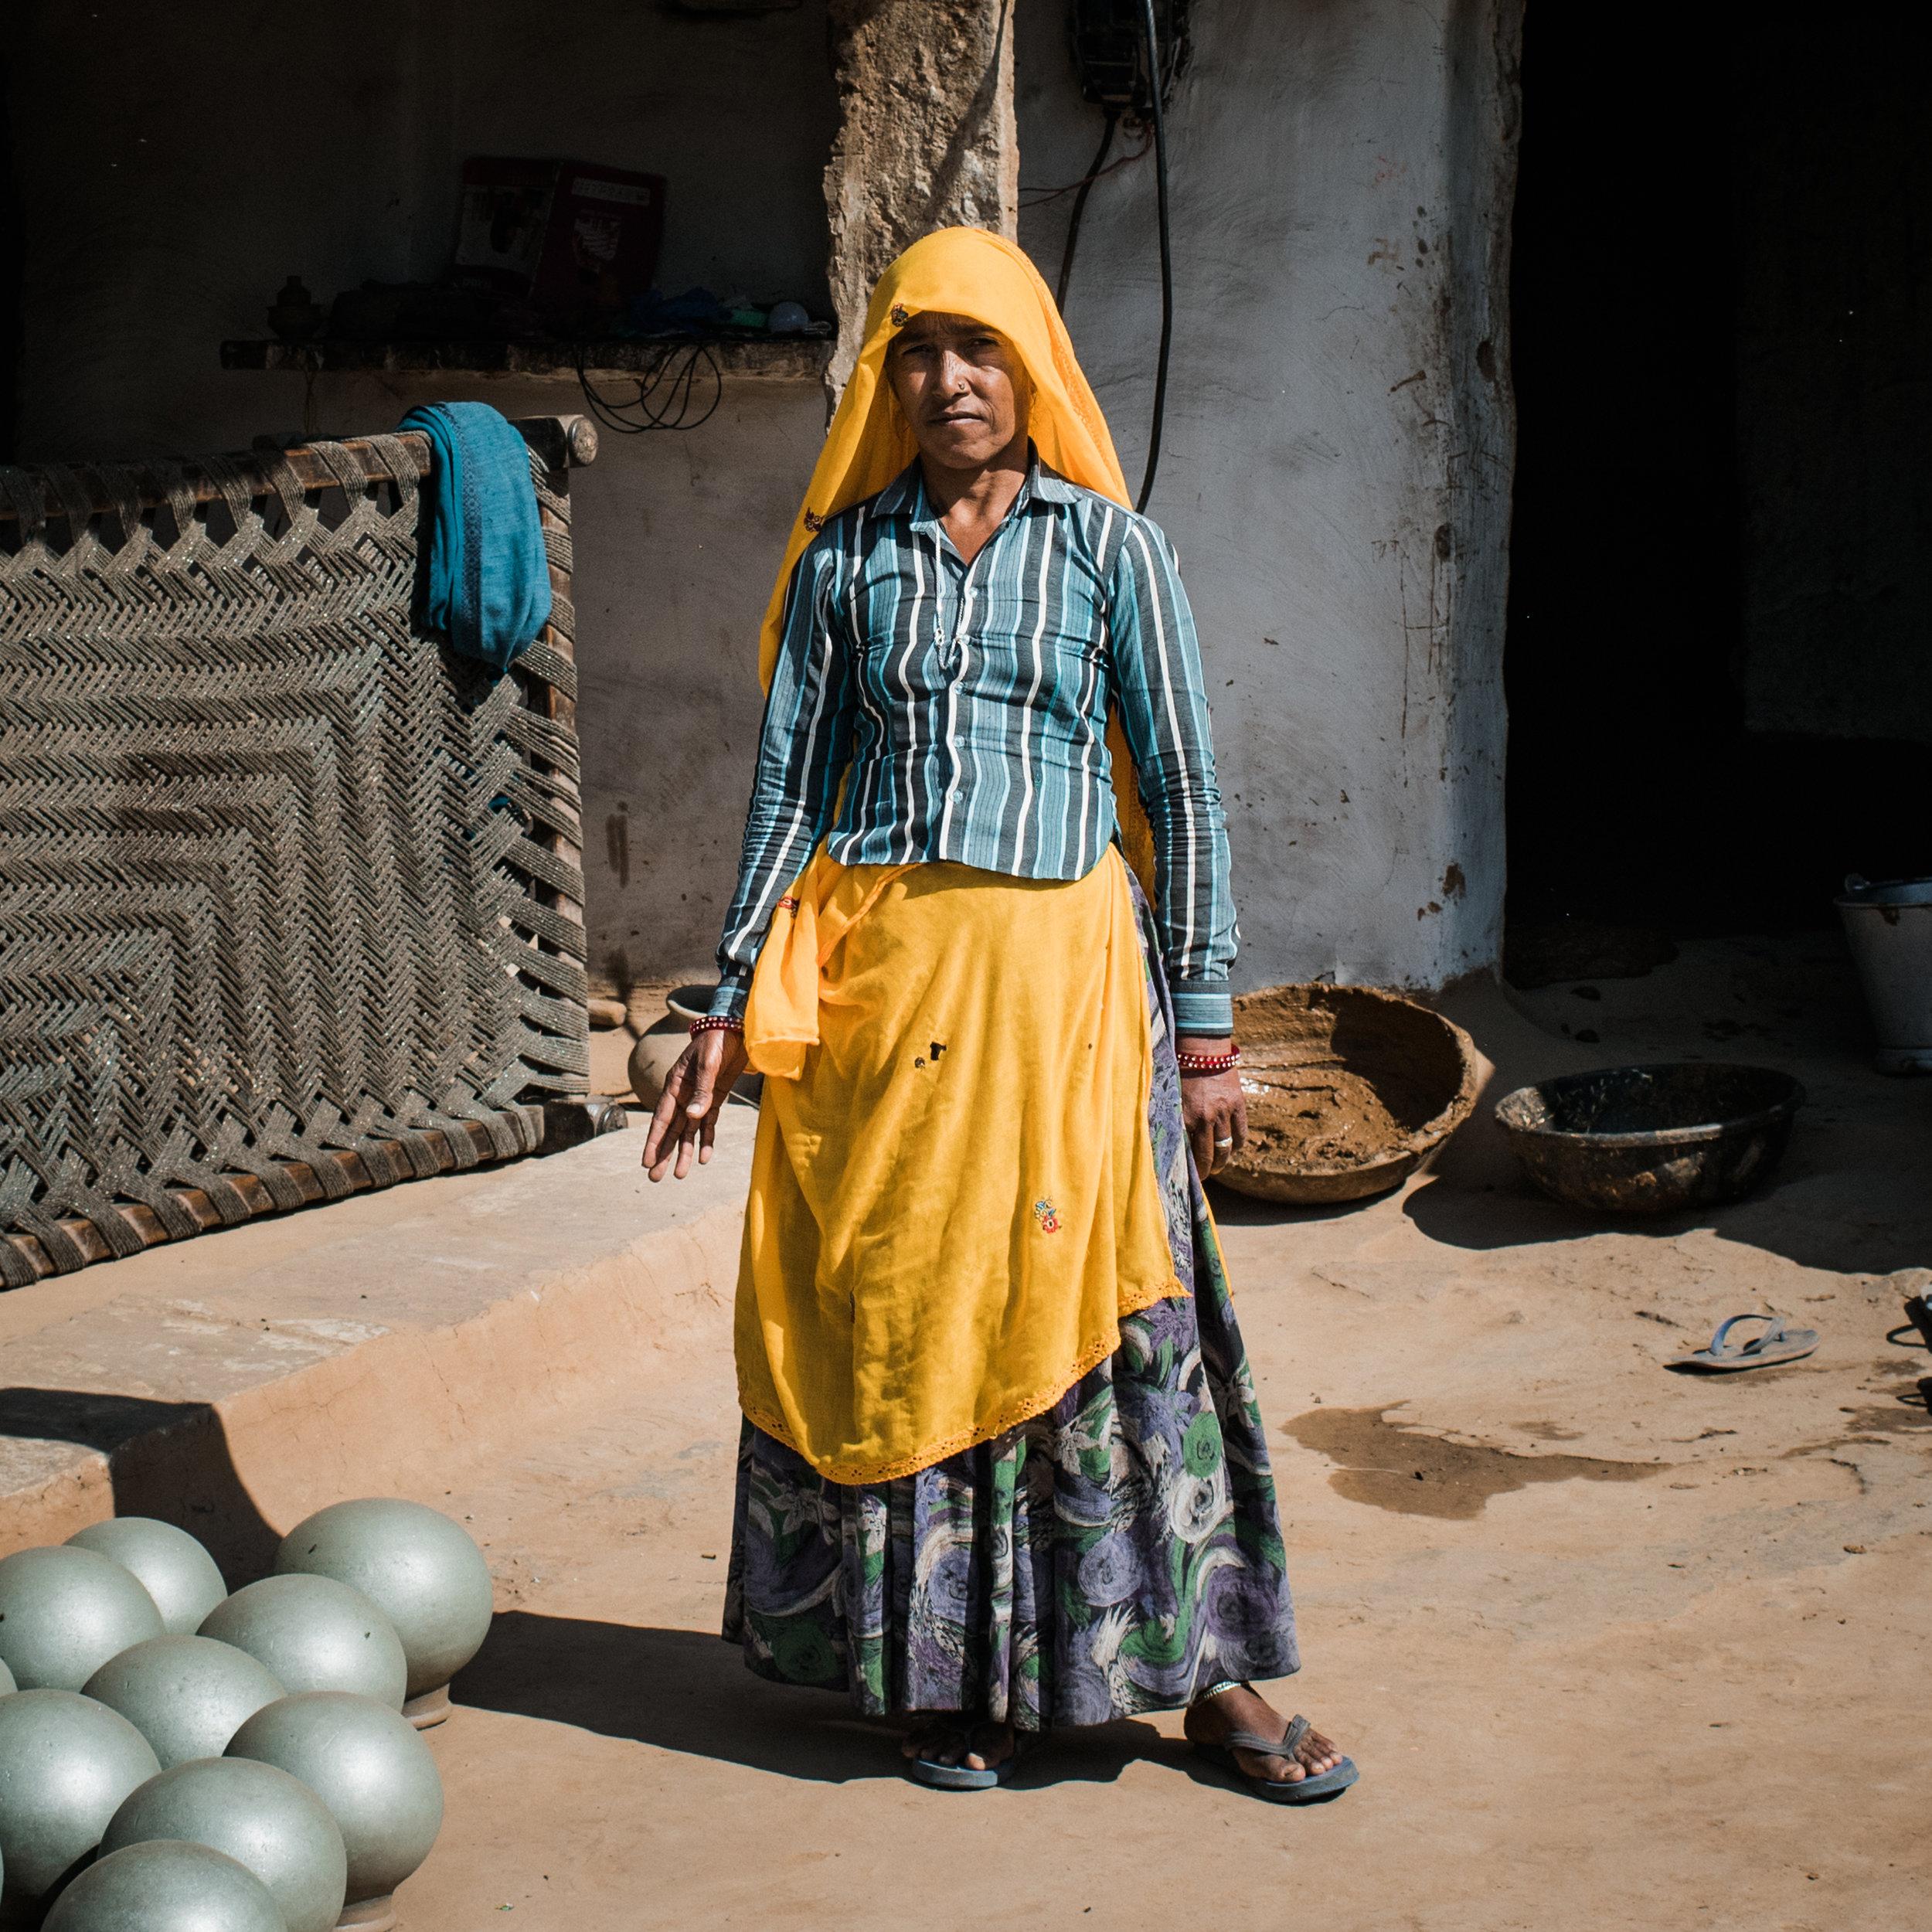 TaraShupe_HumanitarianPhotographer_Woman_Photographer_National_Geographic_022.jpg